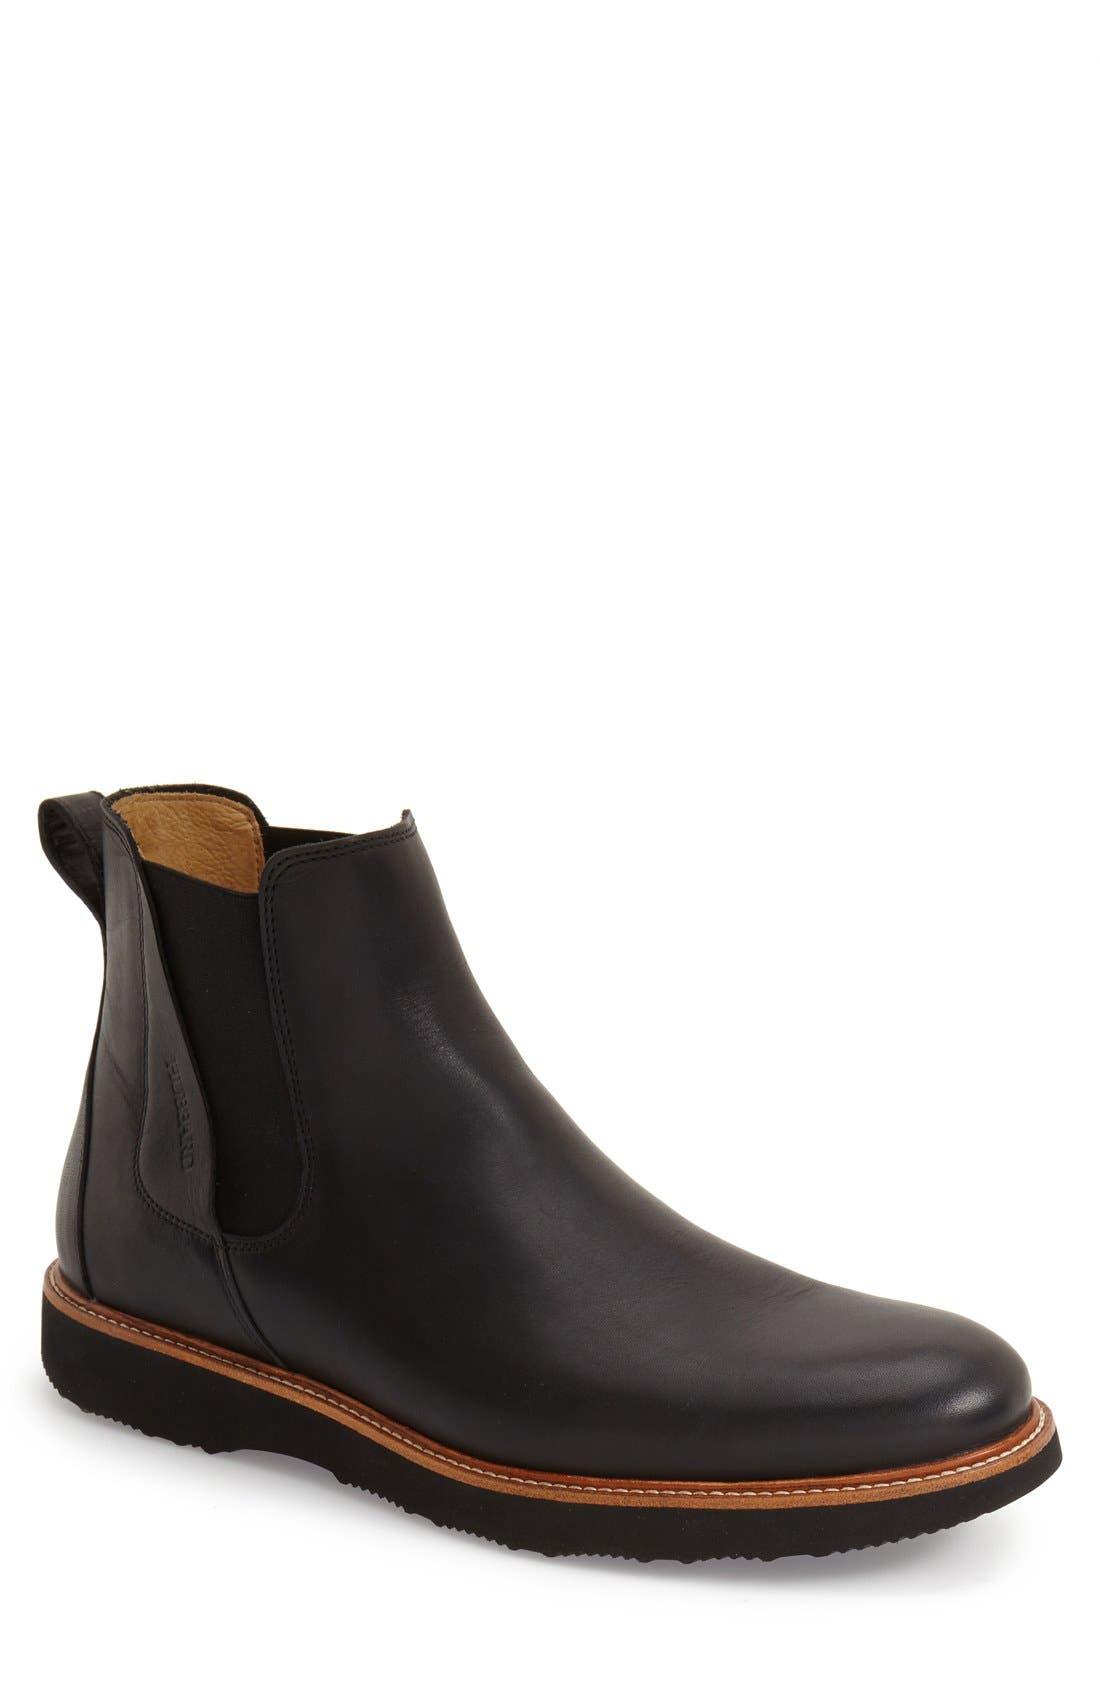 24 Seven Chelsea Boot,                         Main,                         color, Black